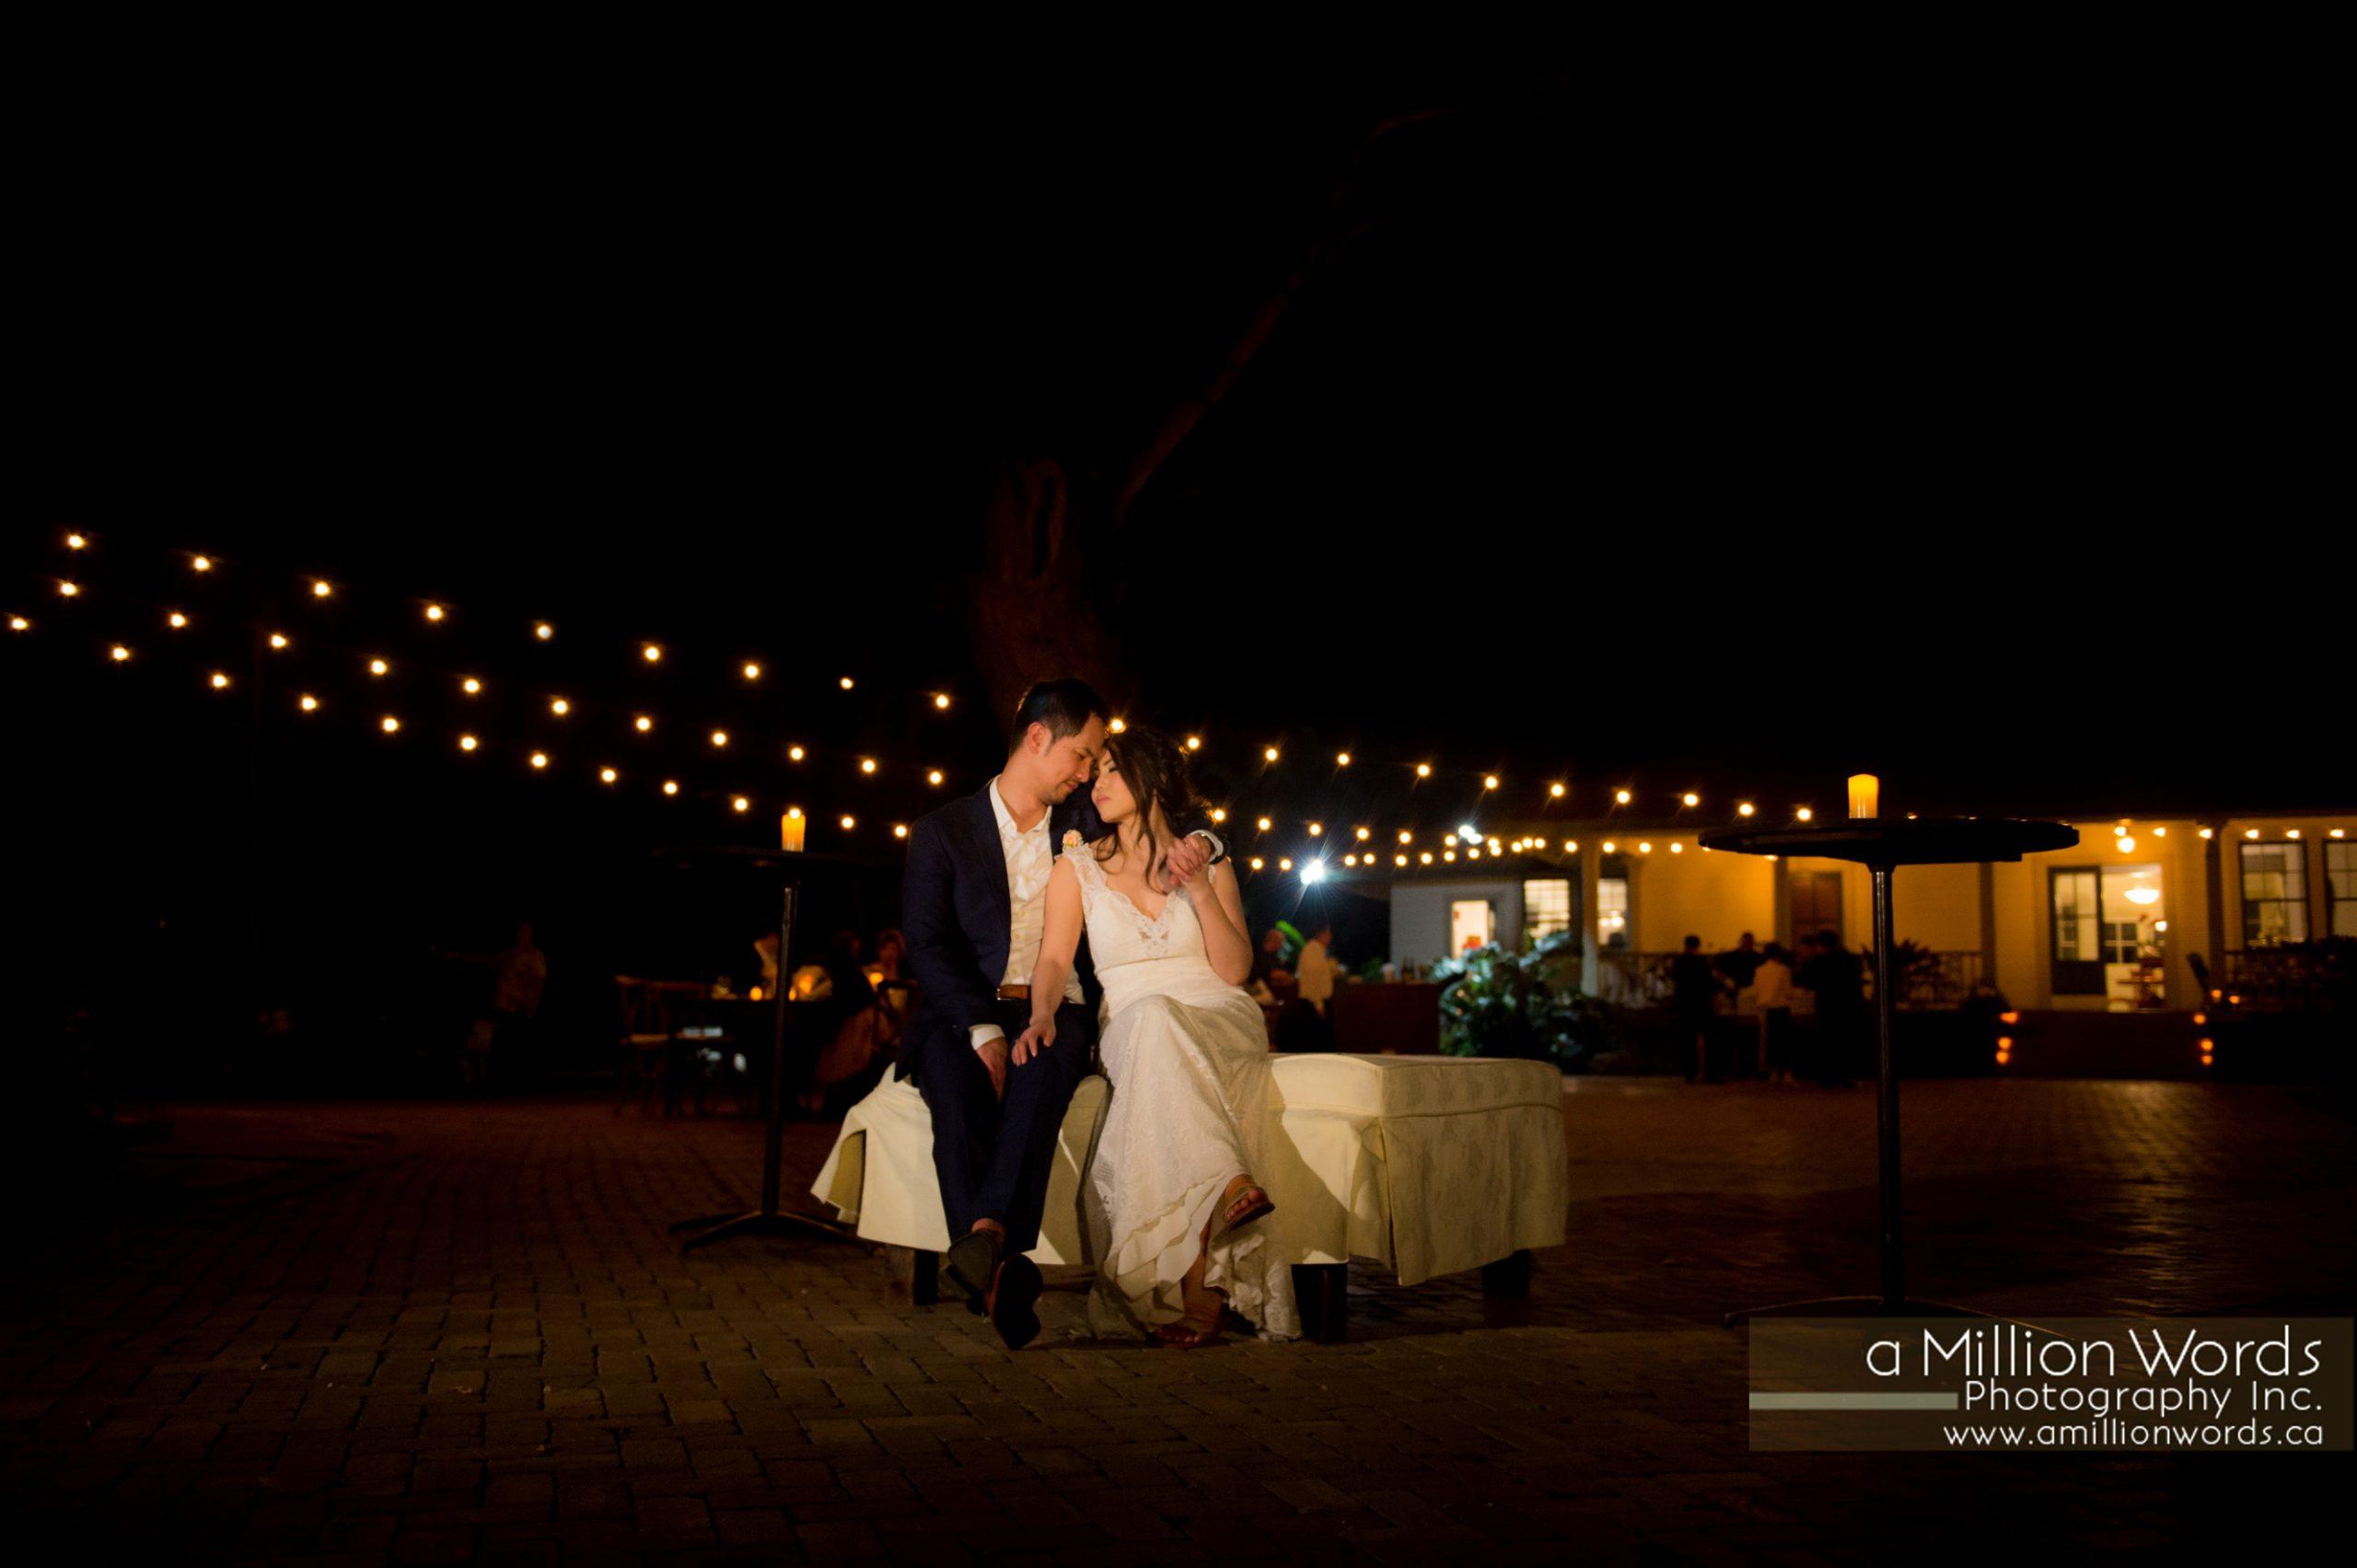 kw_destination_wedding_photography58